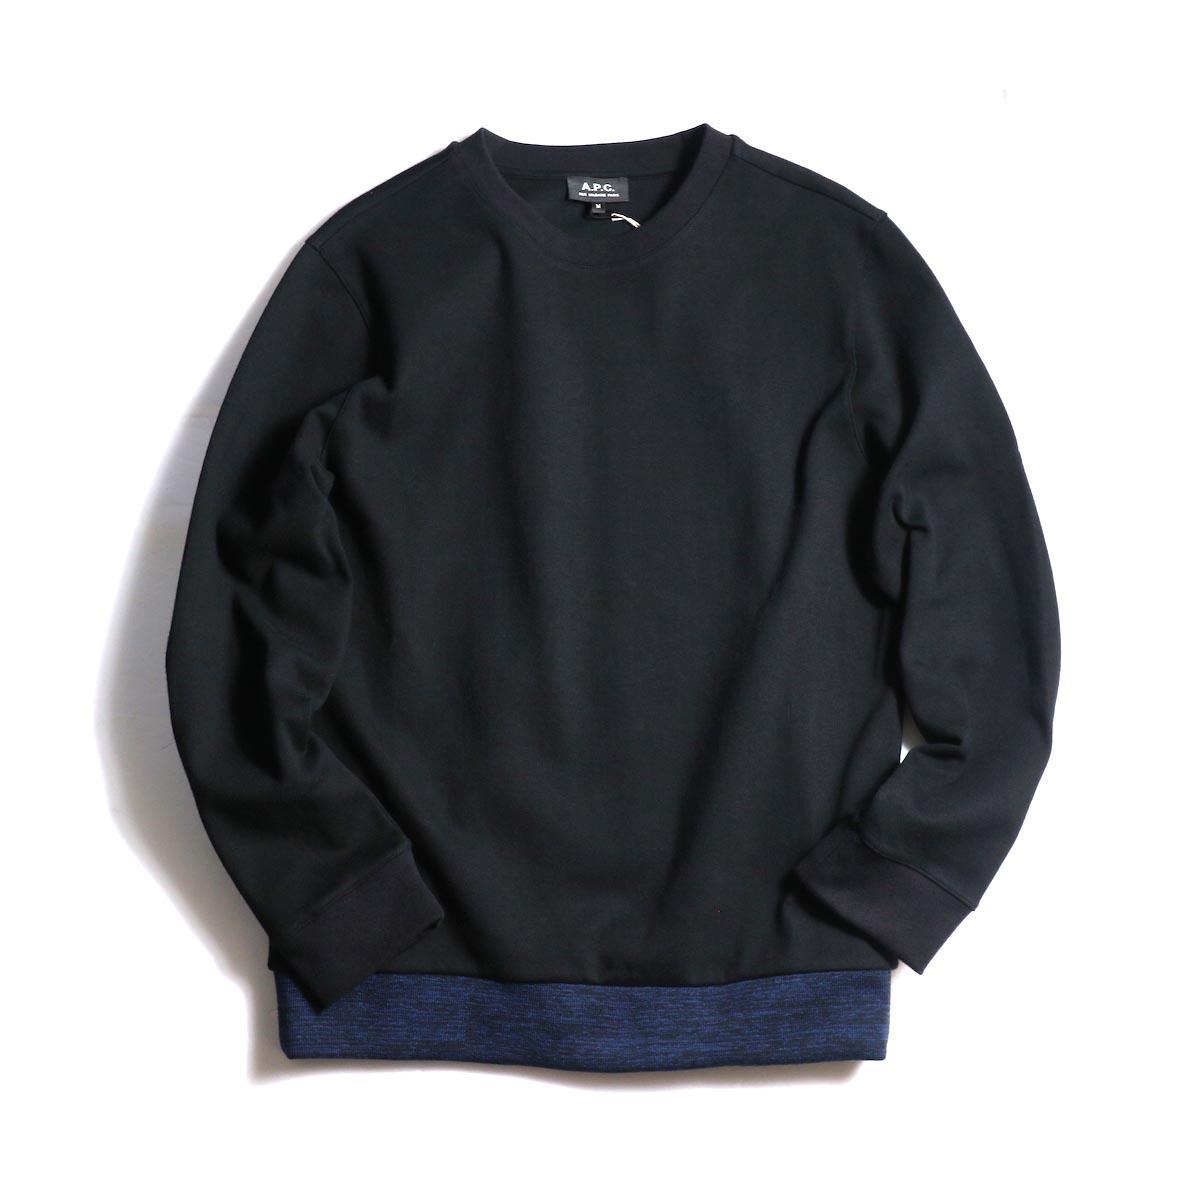 A.P.C. / Jeremie Sweat Shirt -Black